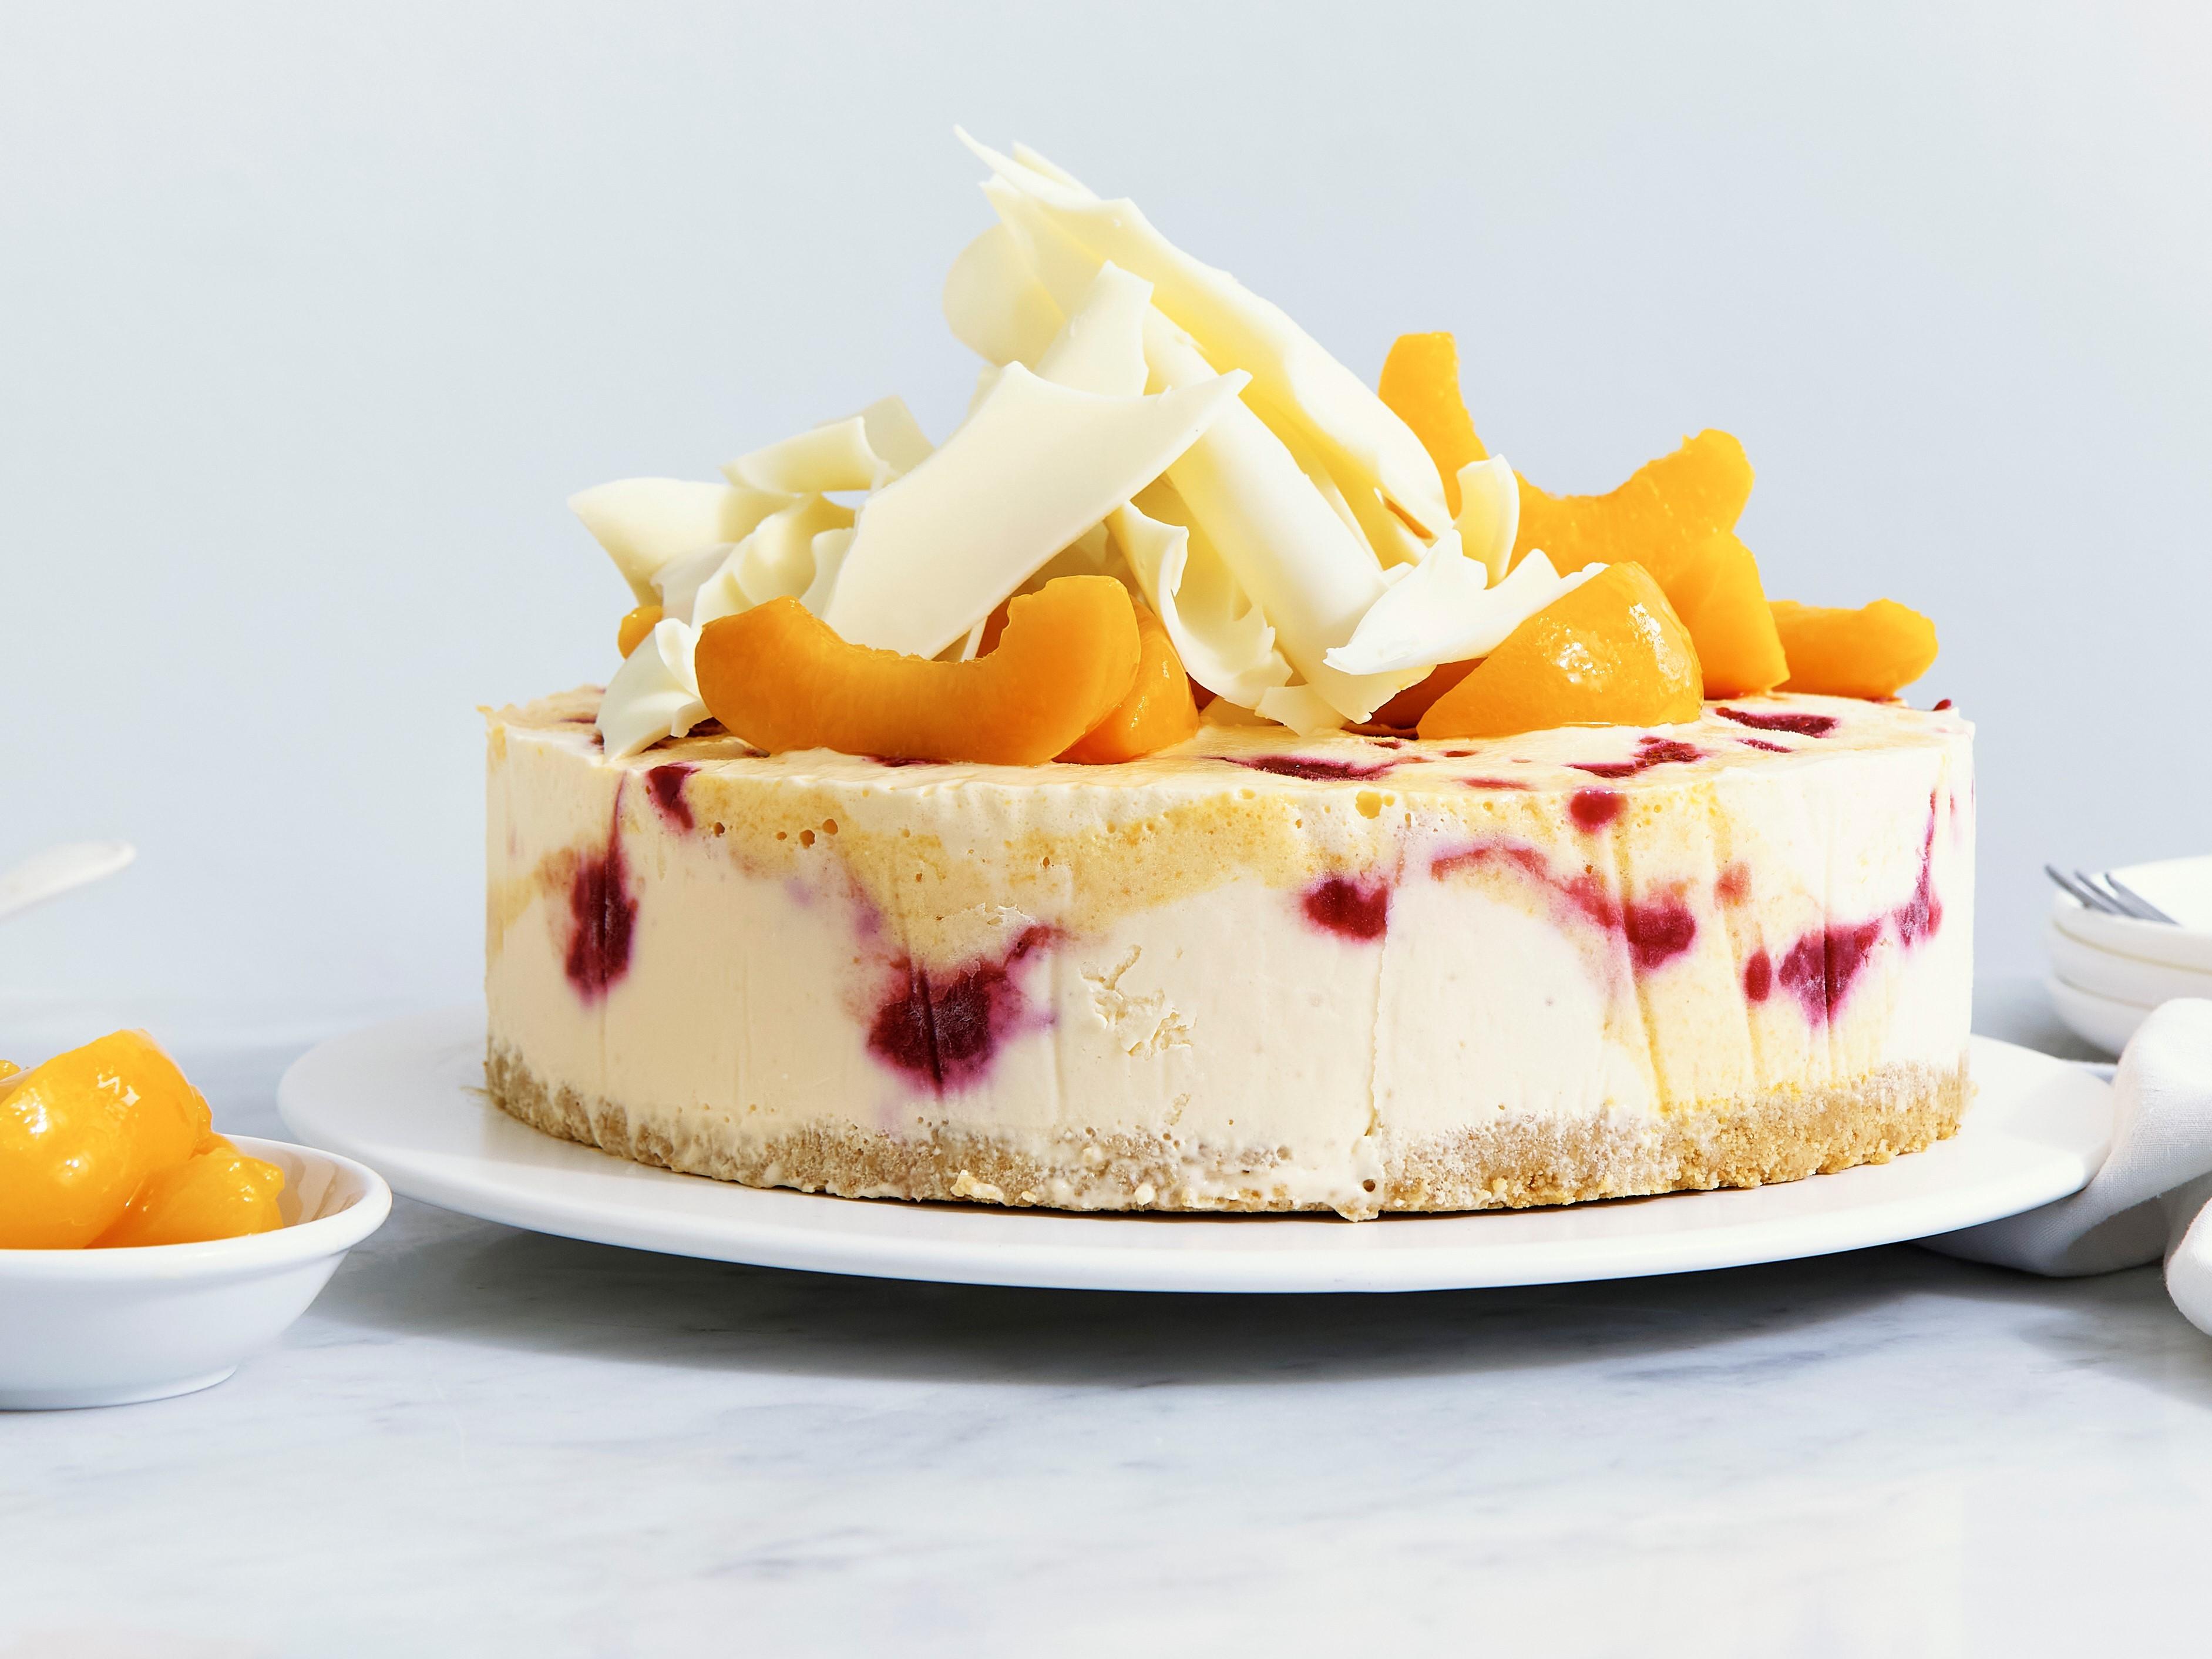 Peach Melba Ice Cream Cheesecake